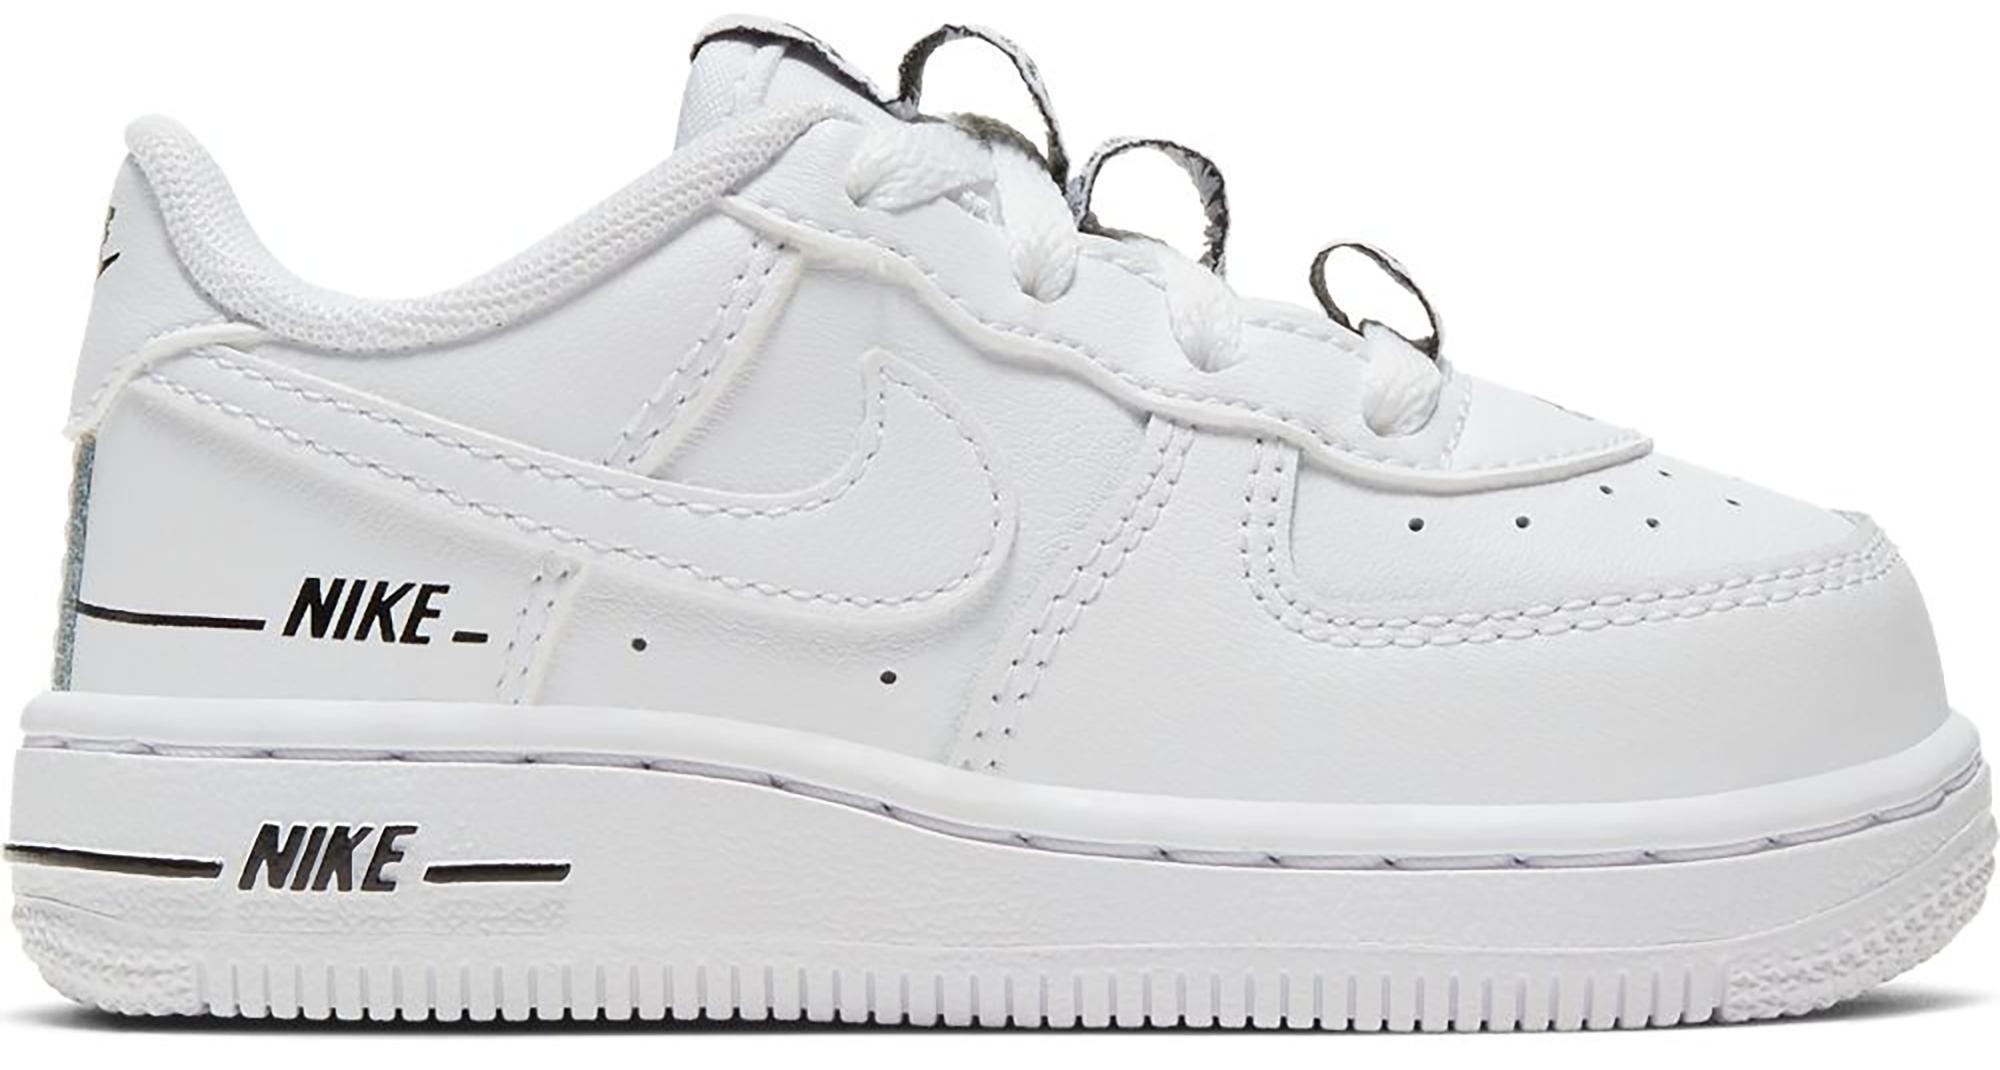 Nike Air Force 1 Low Double Air White Black (TD) White/Black-White ...